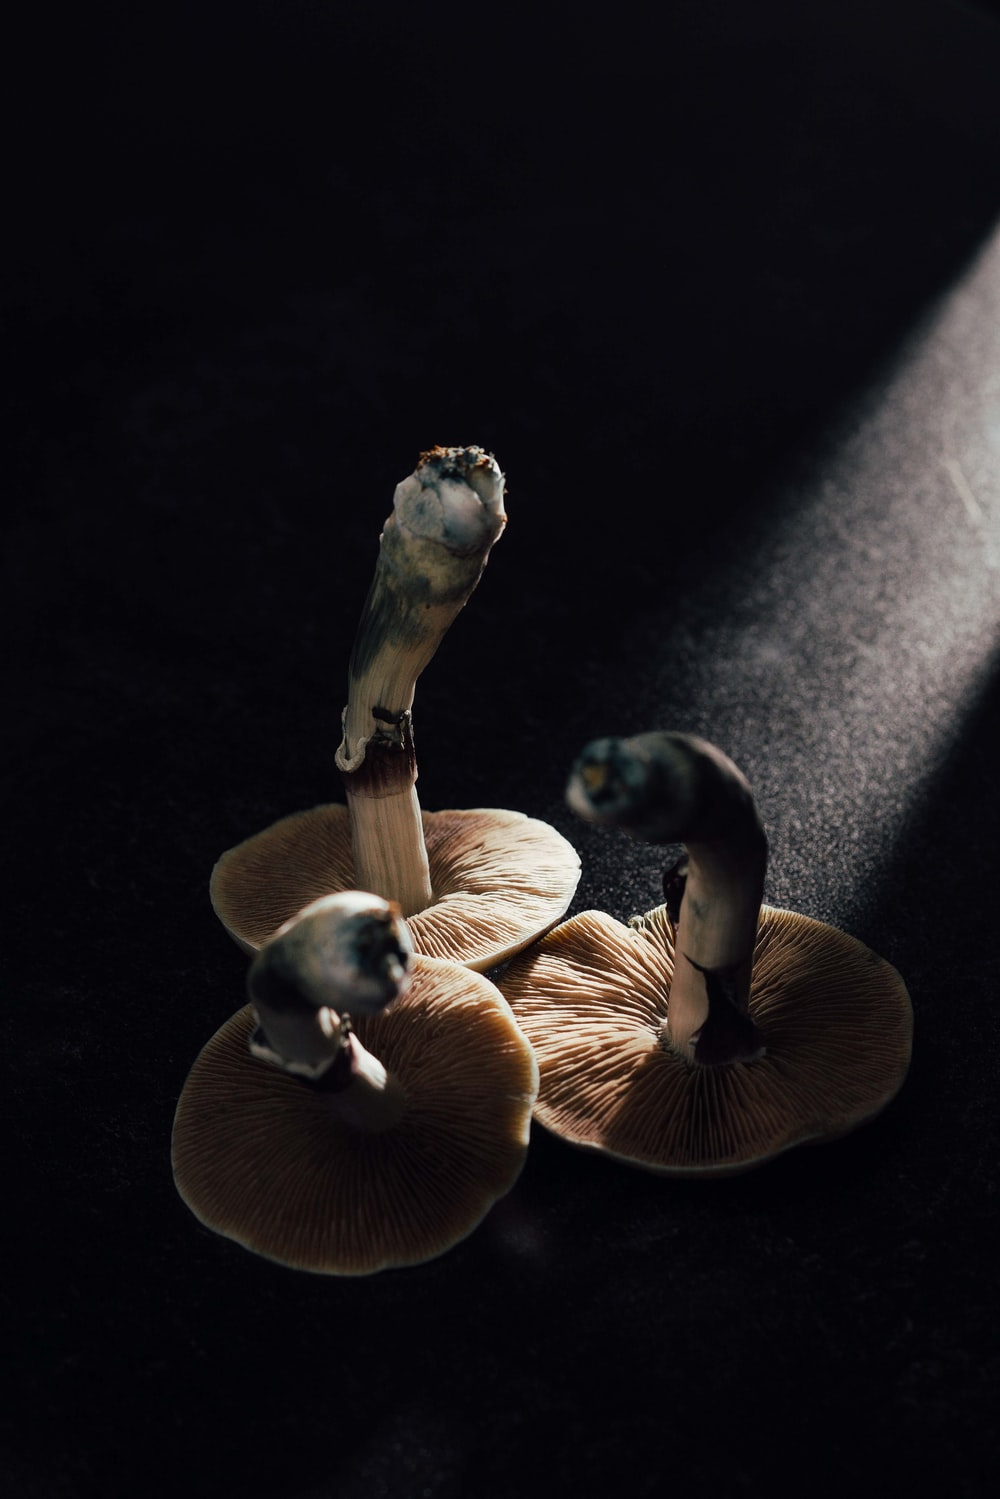 brown mushrooms on black surface